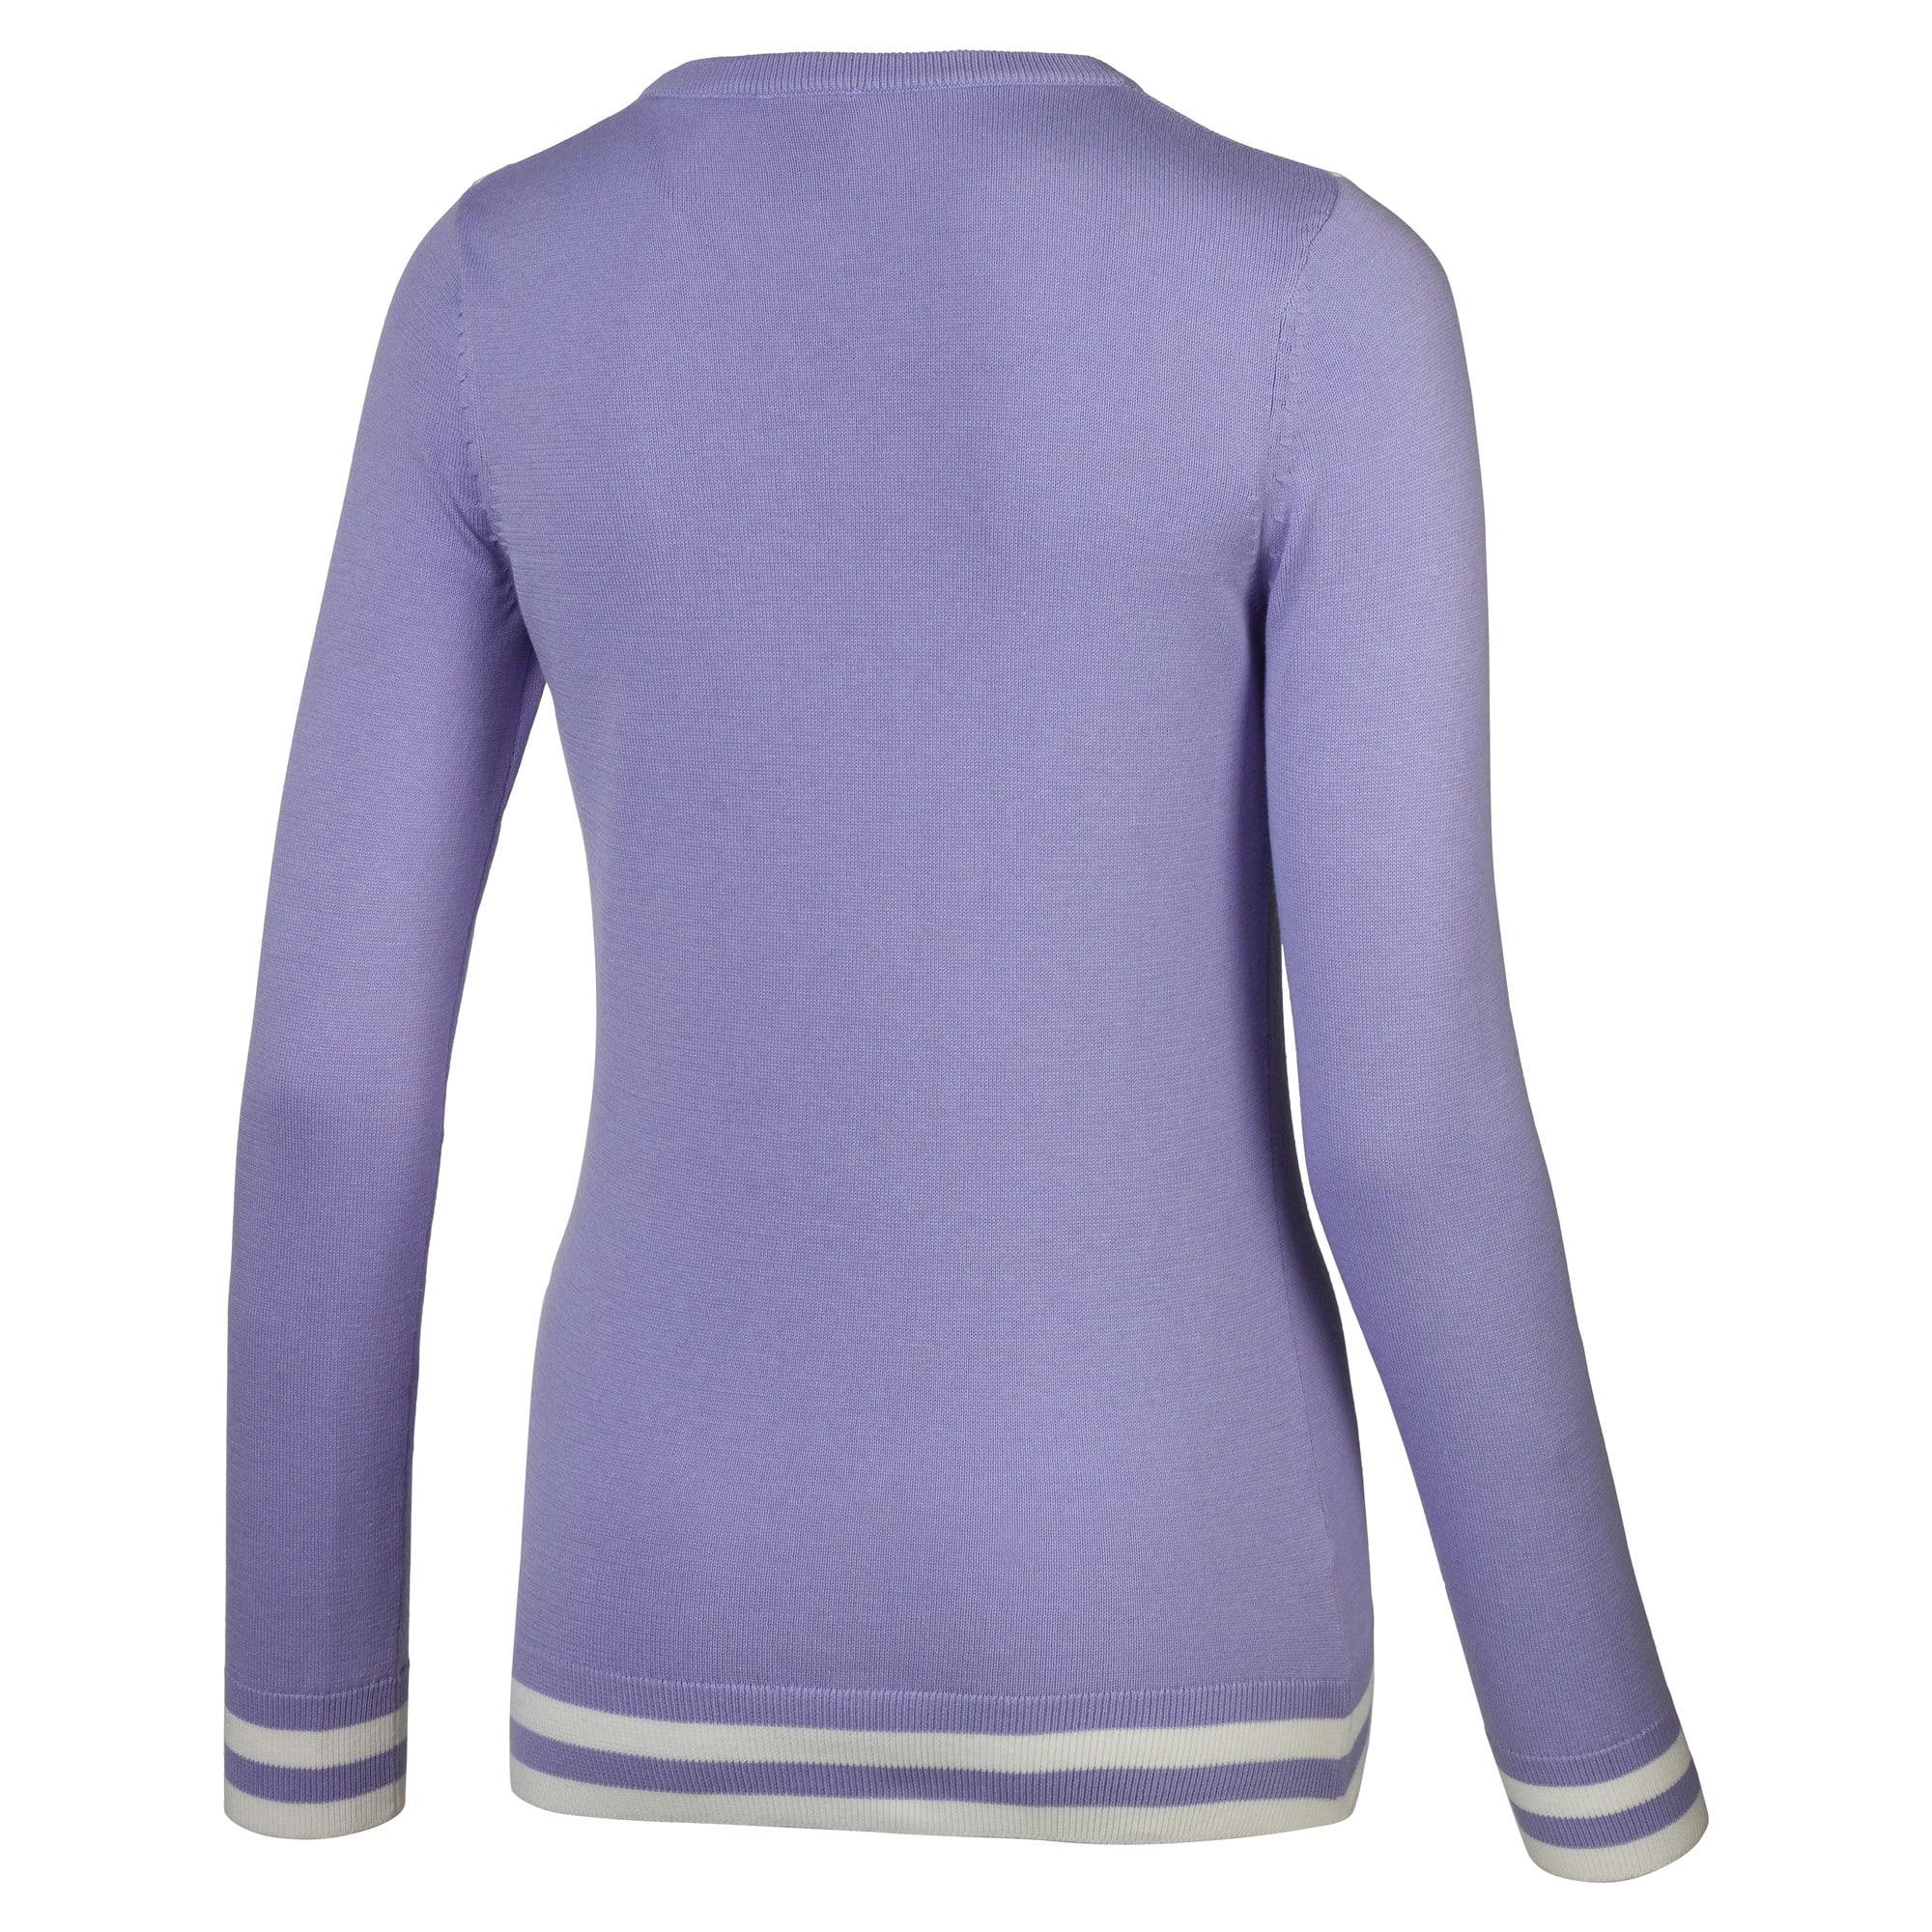 Thumbnail 2 of Chrevron golfsweater voor dames, Sweet Lavender, medium